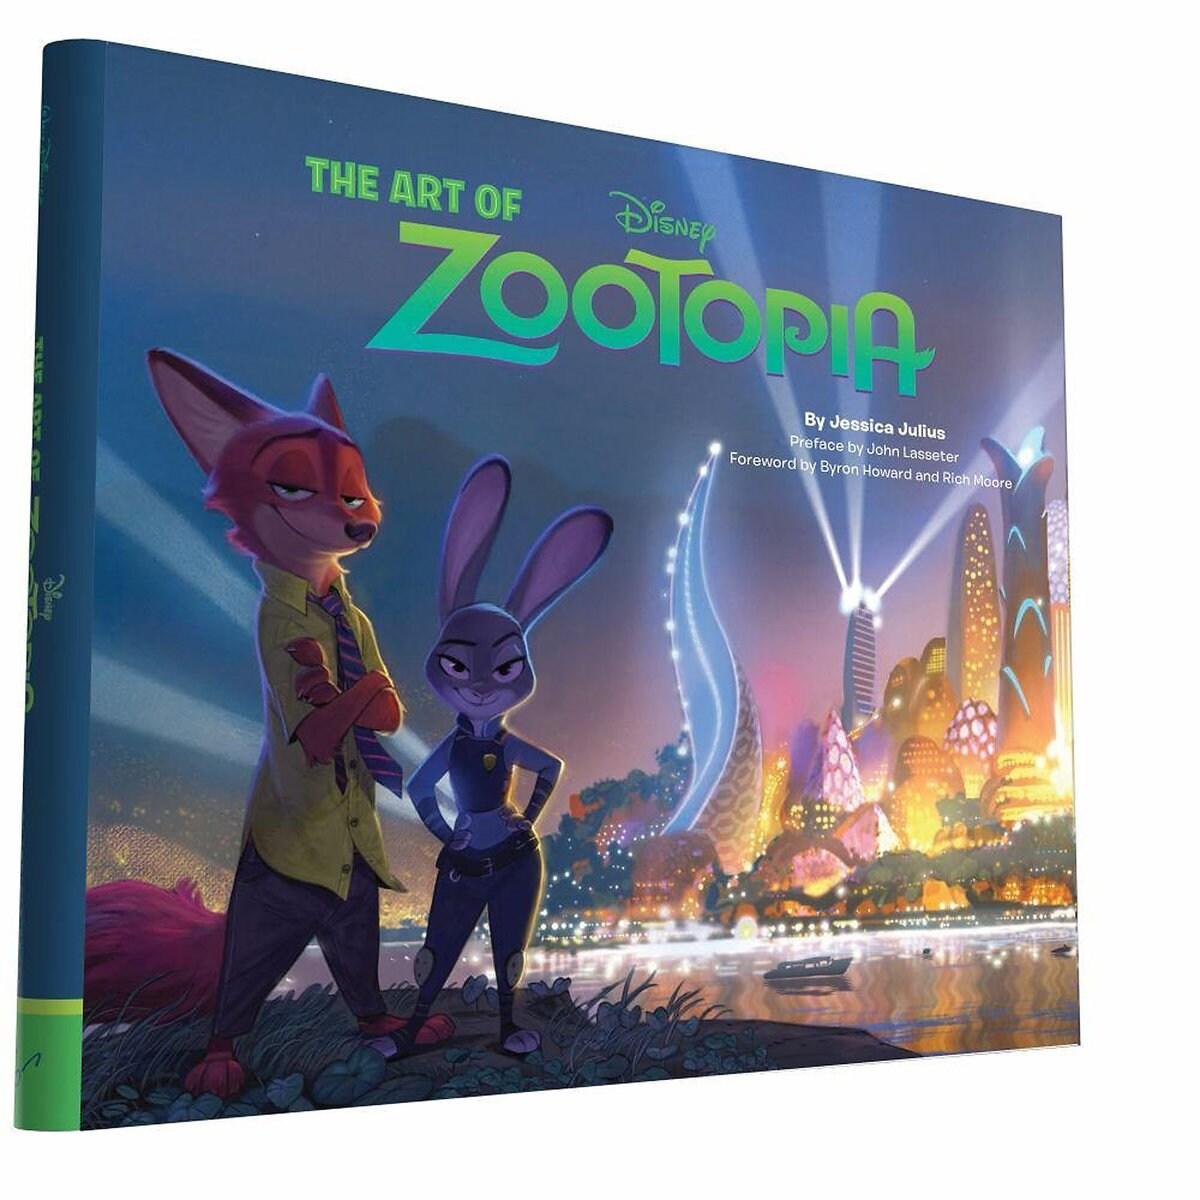 the art of zootopia book shopdisney